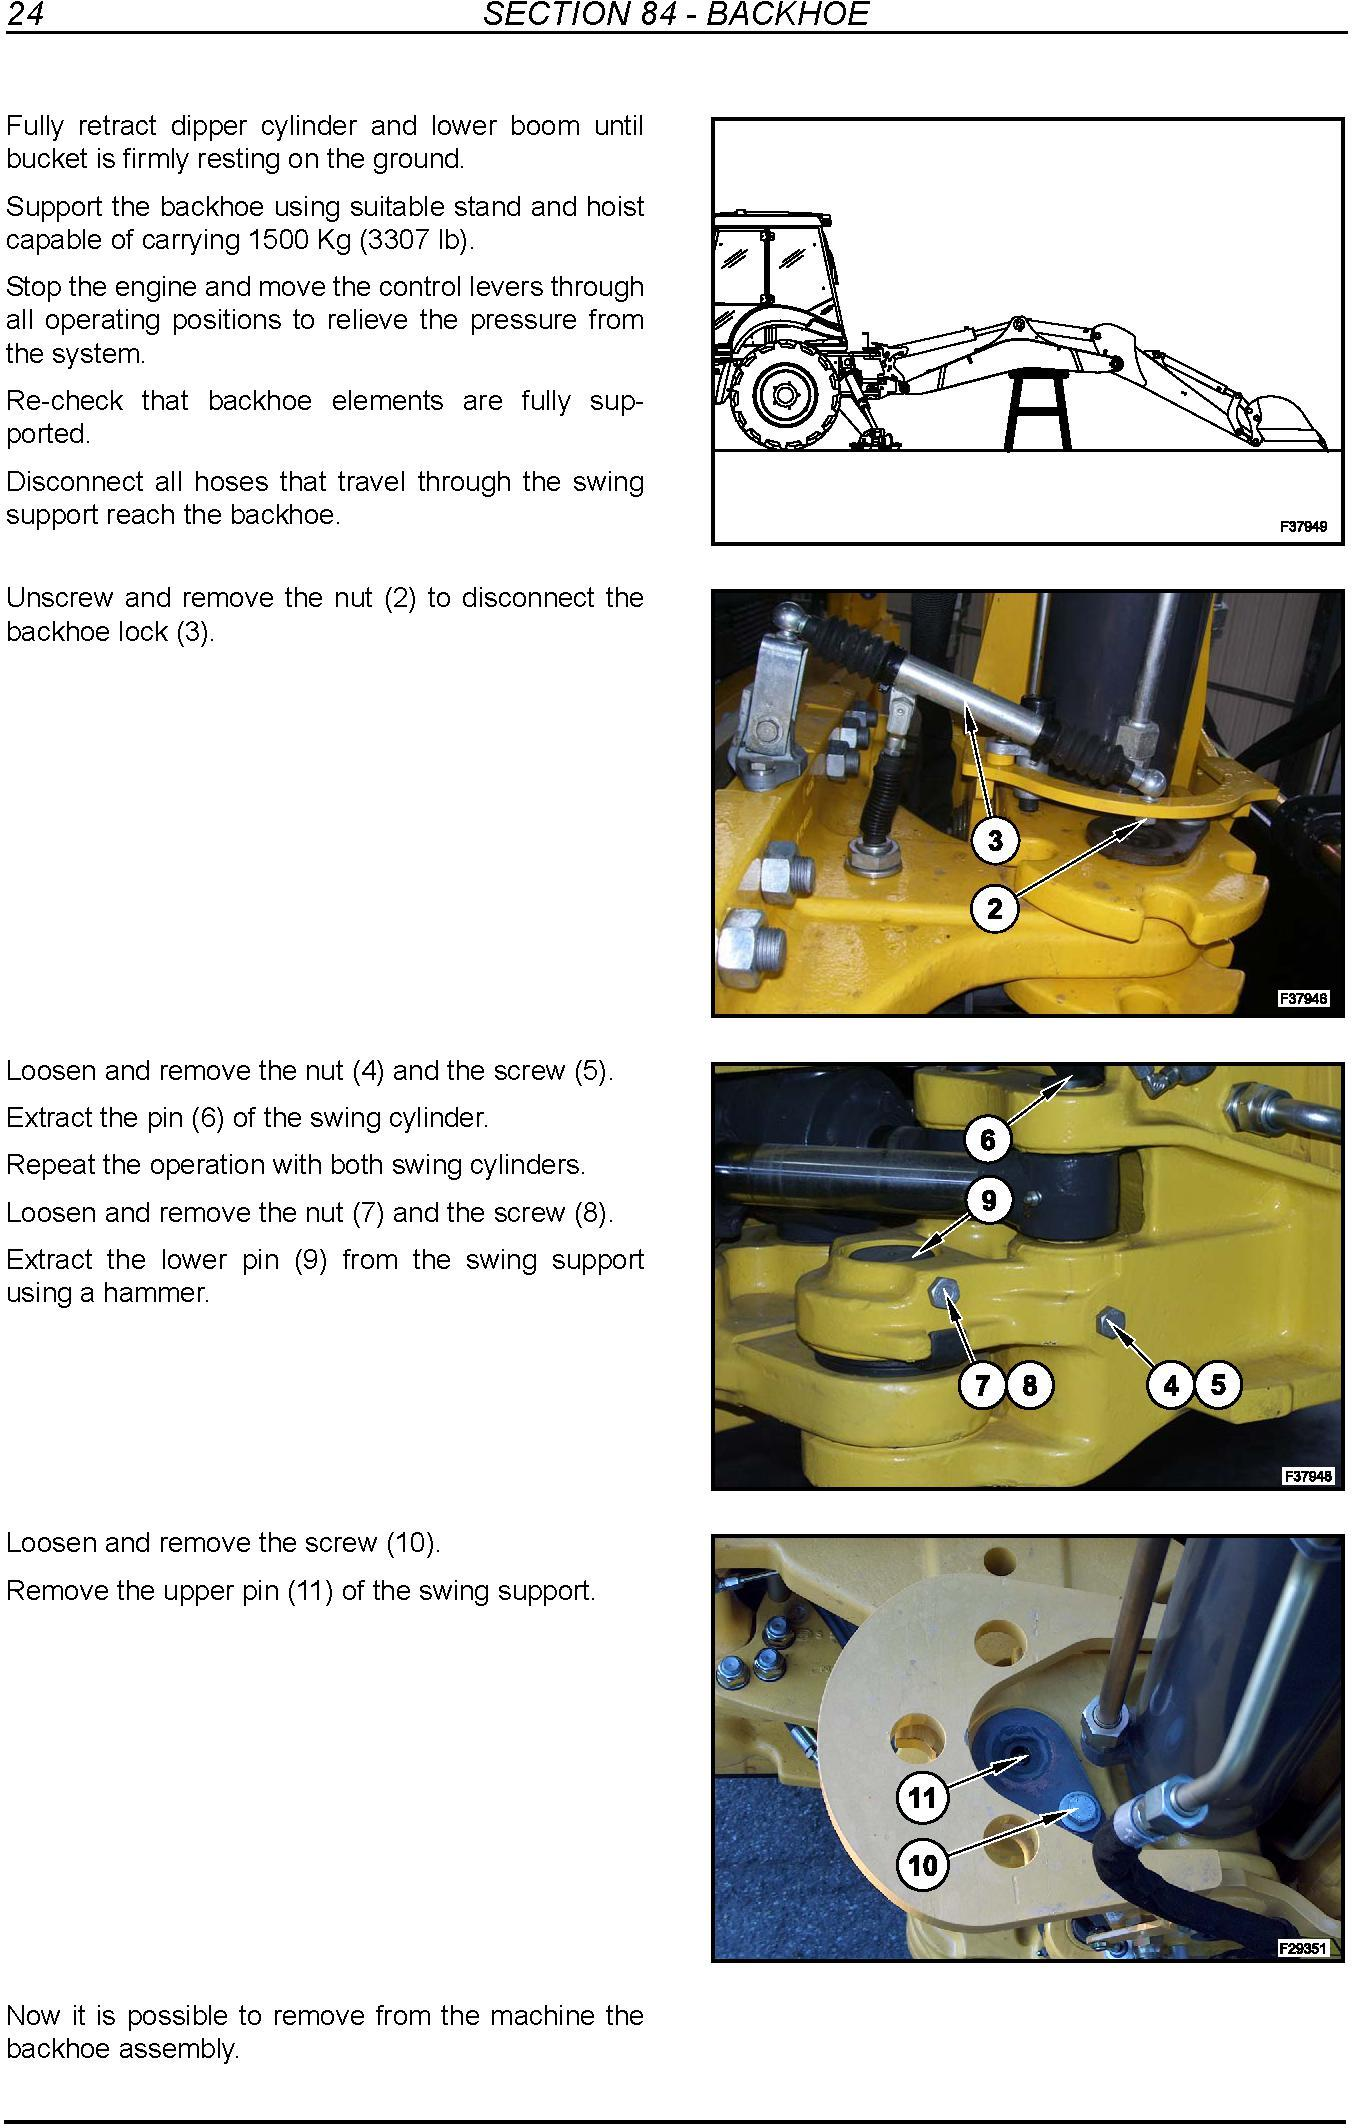 New Holland B90B, B95B, B95BLR, B95BTC, B110B, B115B Backhoe Loader Tier 3 Service Manual - 2